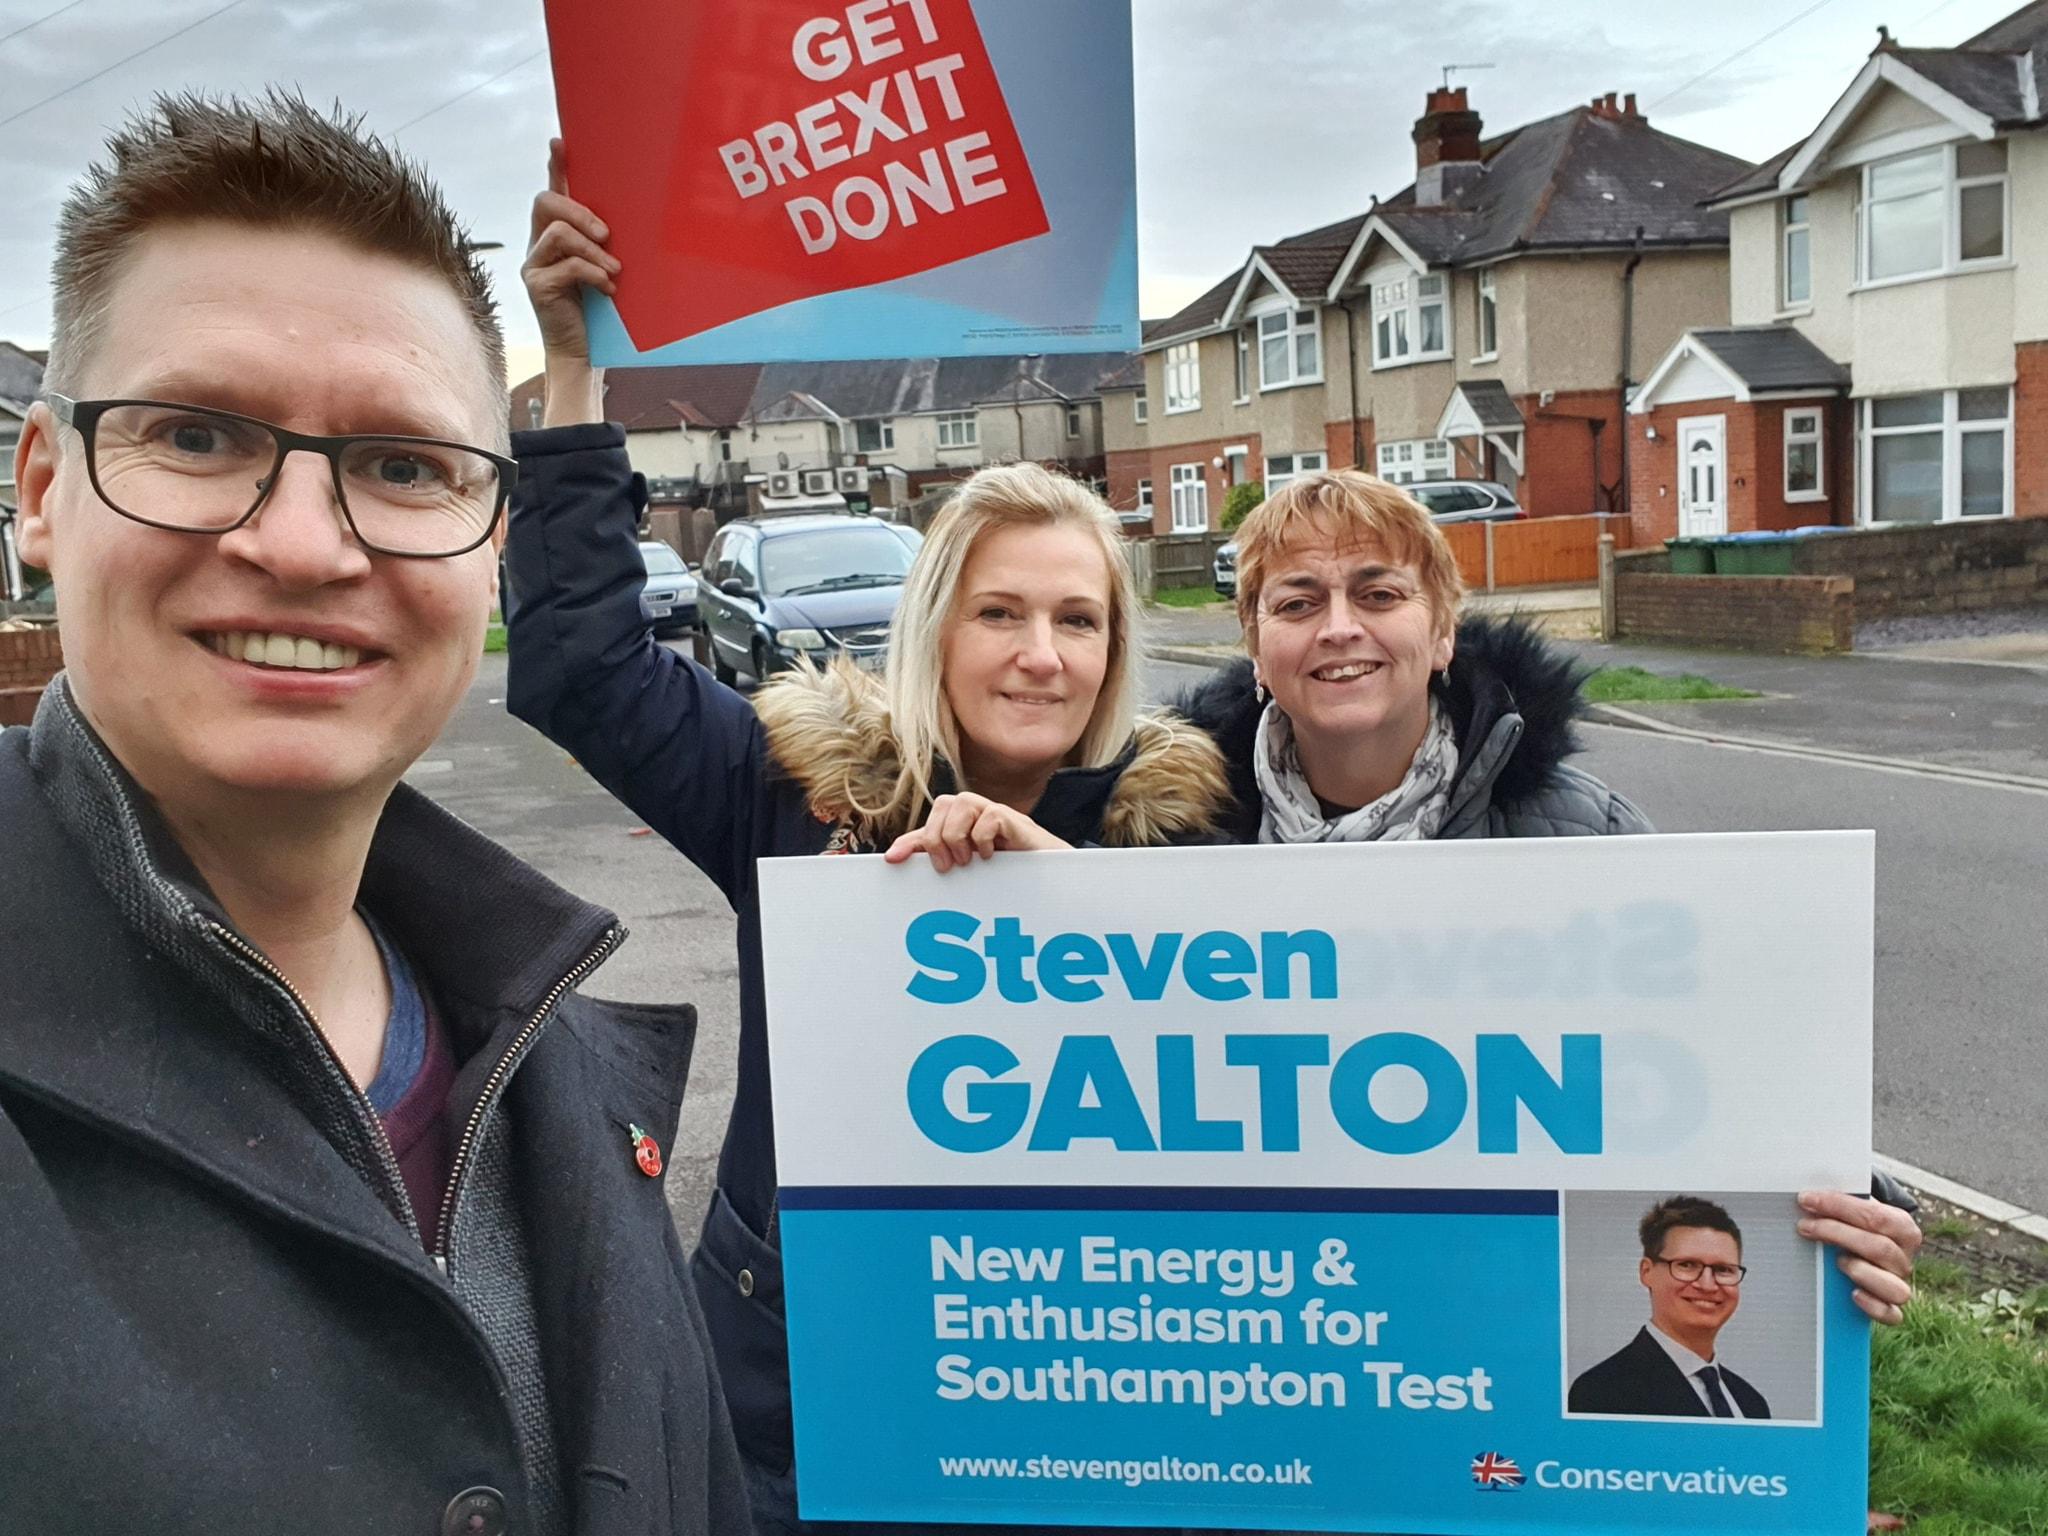 Steven Galton in Redbridge Ward, Southampton Test